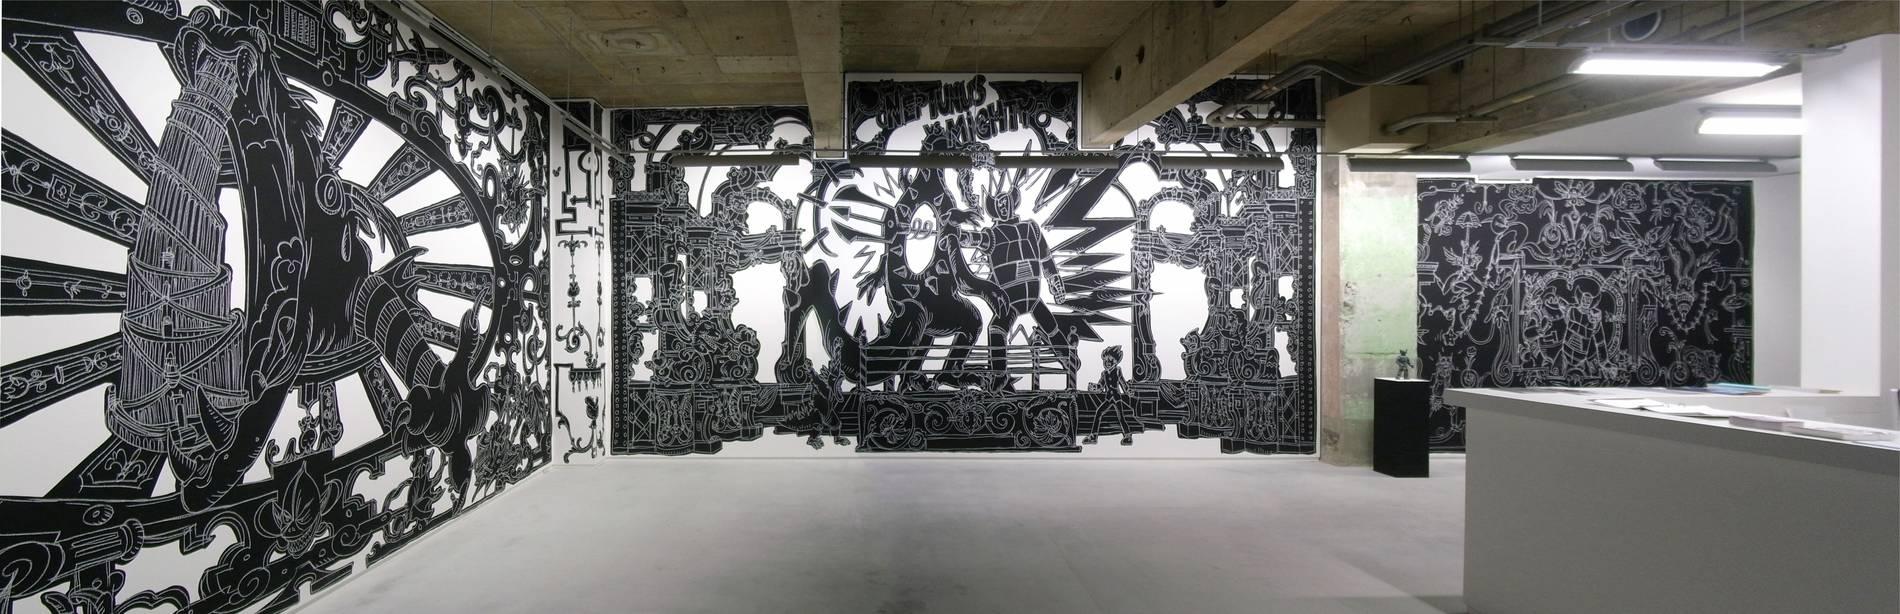 ·: Nicolas Buffe :· - Nicolas Buffe - 2010---01 - La Tour, Megumi Ogita Gallery, panoramique_01_19x61cm, wall drawing, chalk, paint-mini